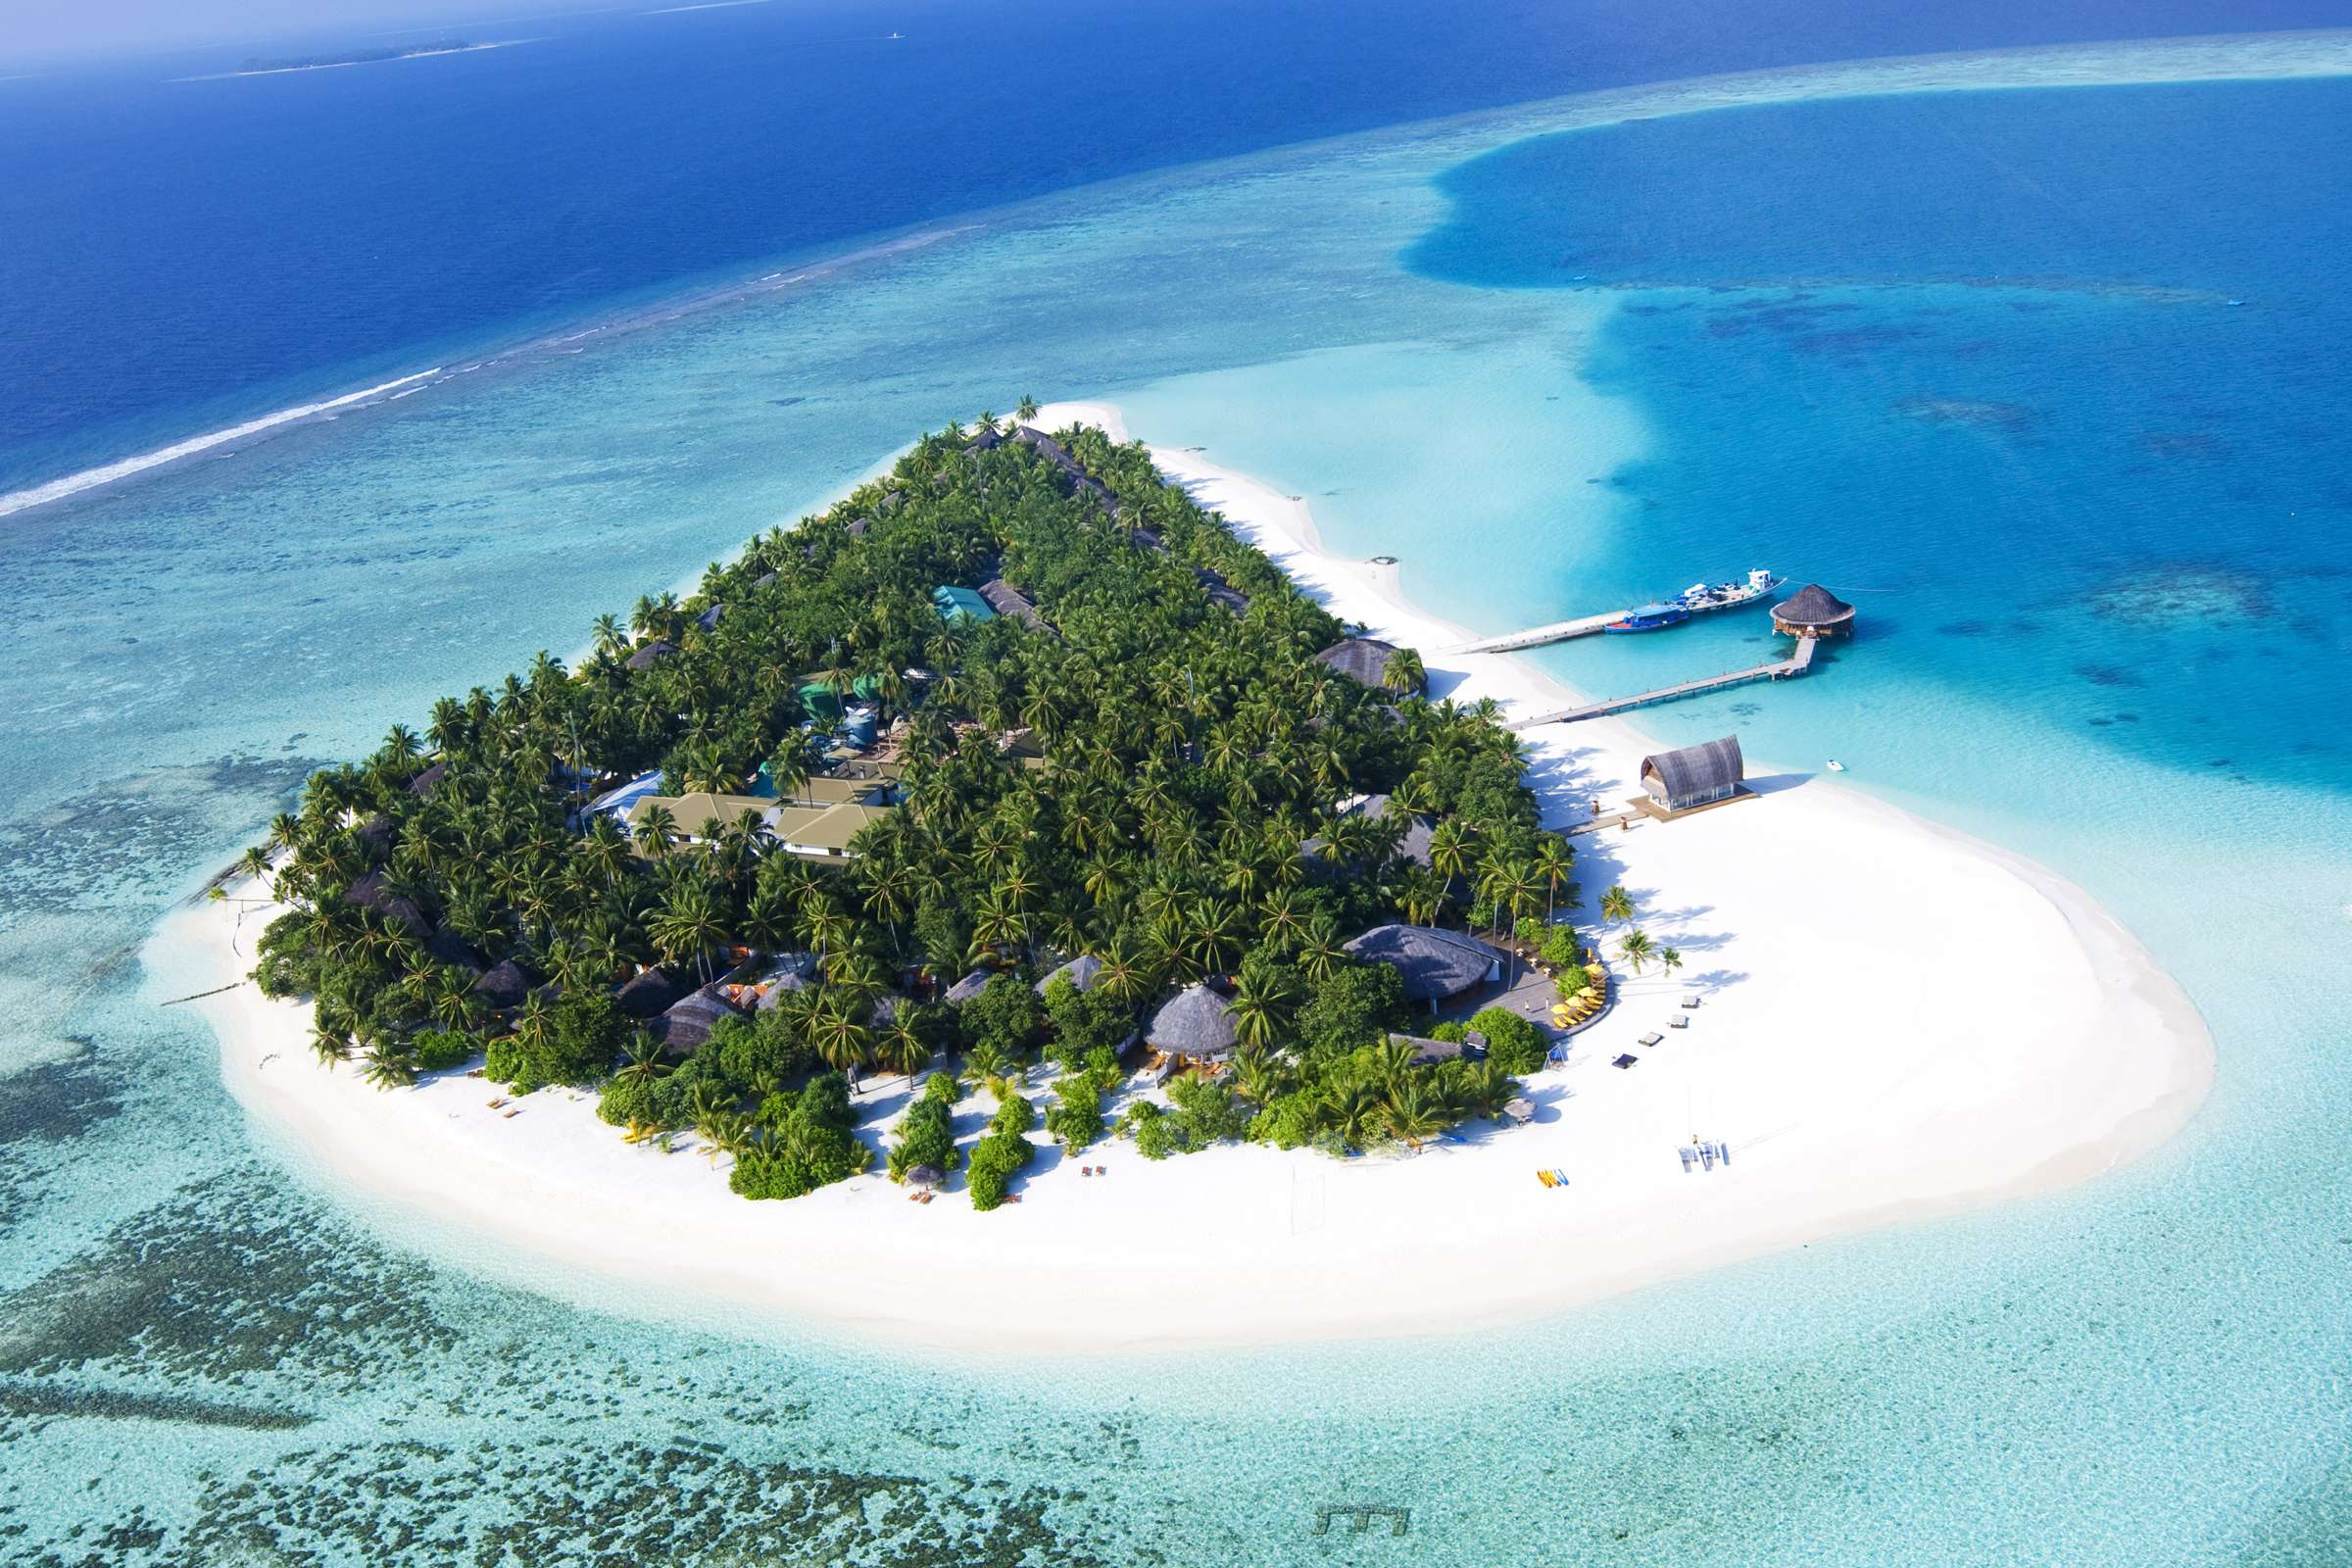 Maldives: Luxury 5* All-Inc Private Island Retreat inc. Water Villa w/Infinity Pool Upgrade & Extras - Save 50%